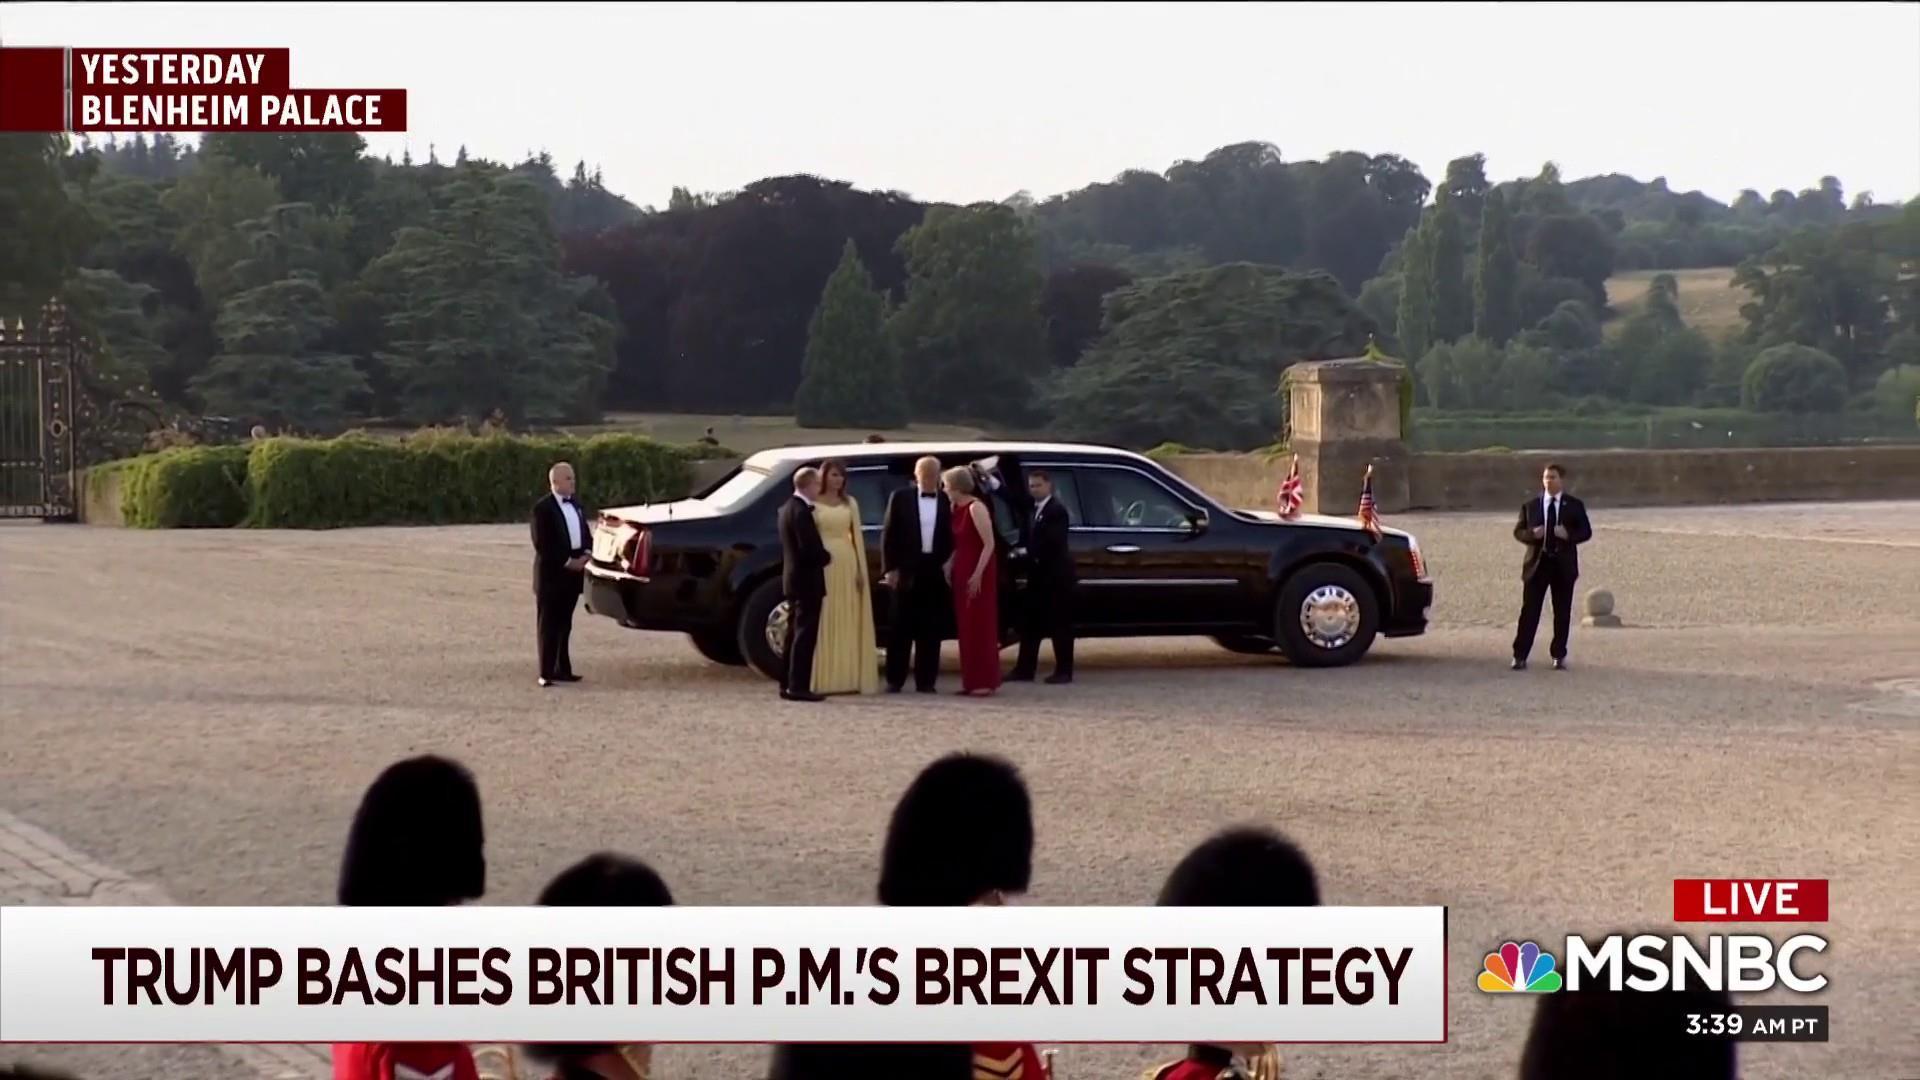 Trump drives bulldozer 'straight through' Brexit plan